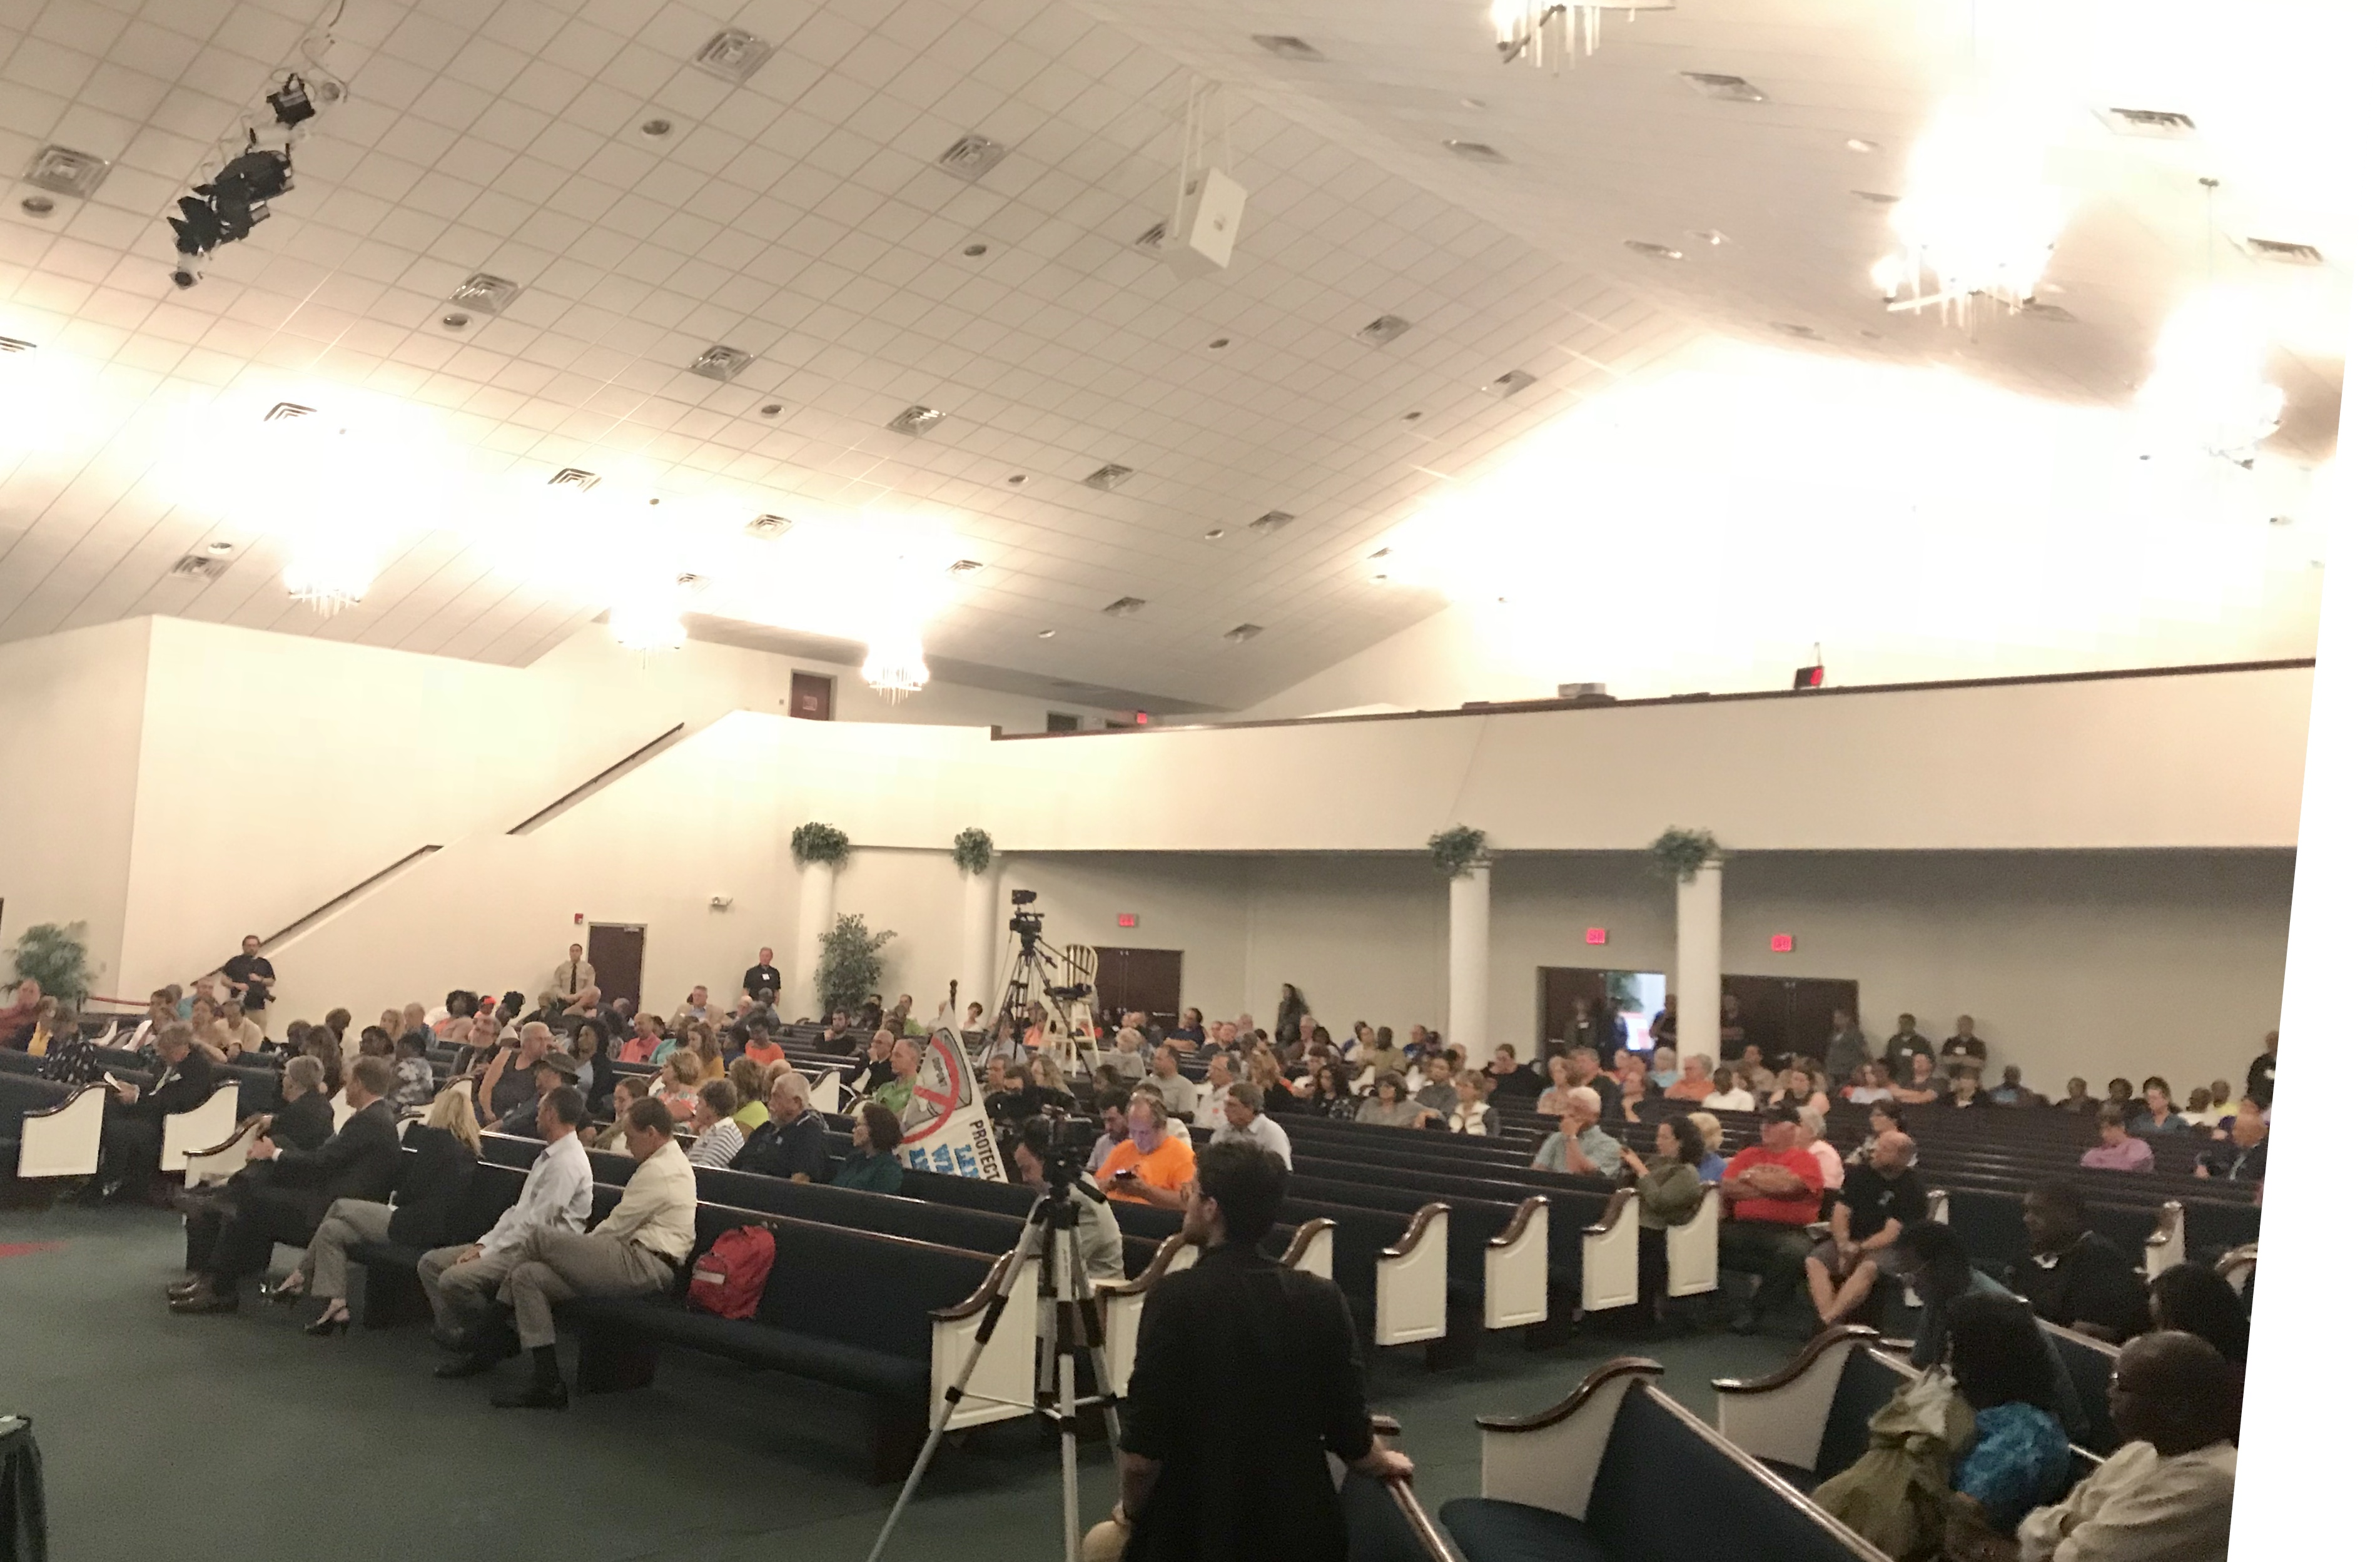 Chemours Town Hall, St. Pauls, June 12, 2018